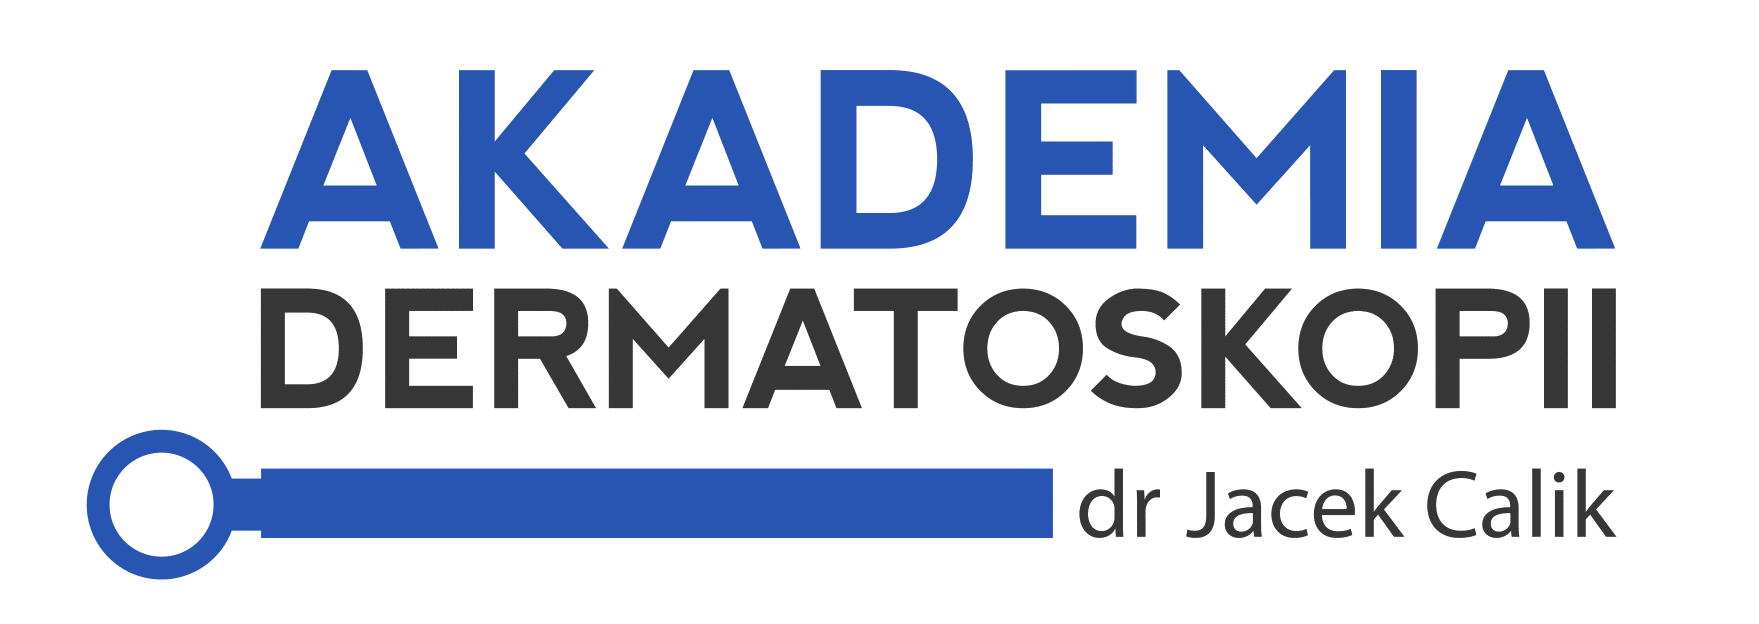 Akademia Dermatoskopii - Jacek Calik